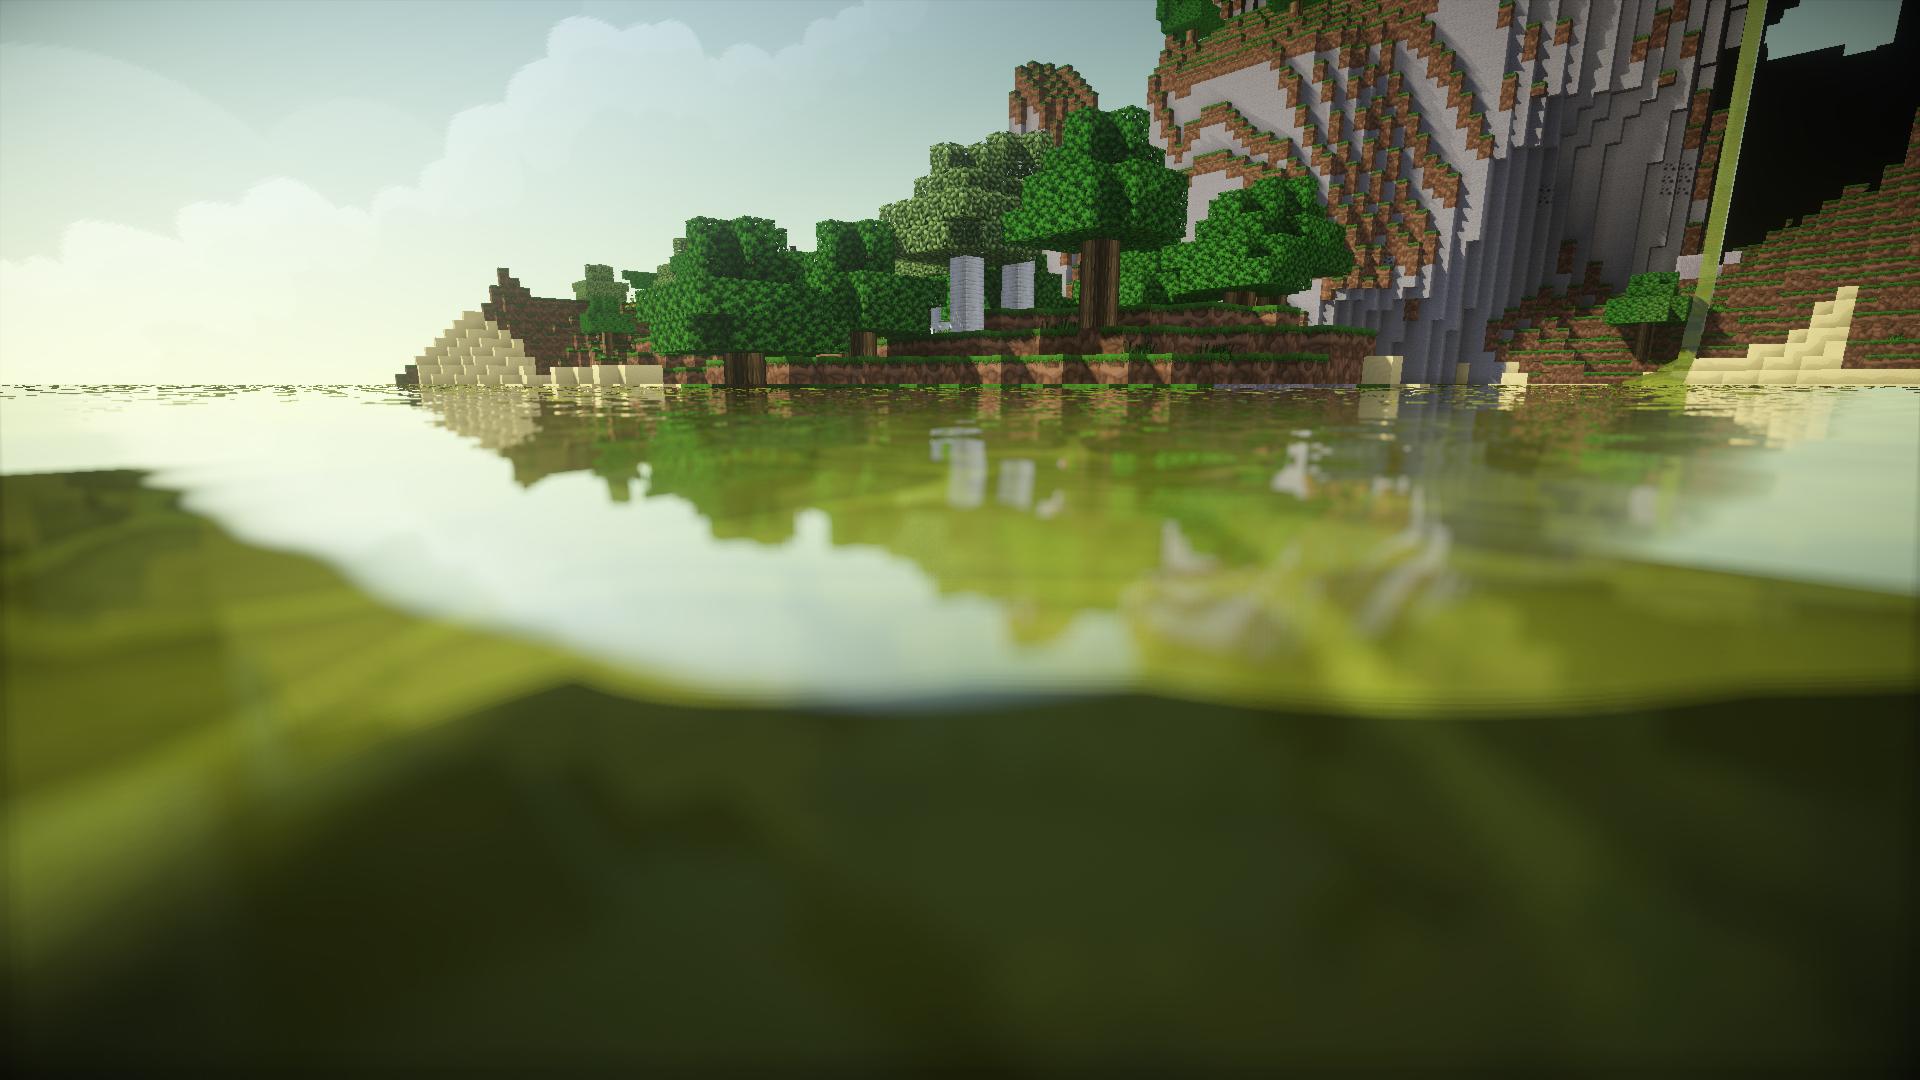 Minecraft World Hd Wallpaper Background Image 1920x1080